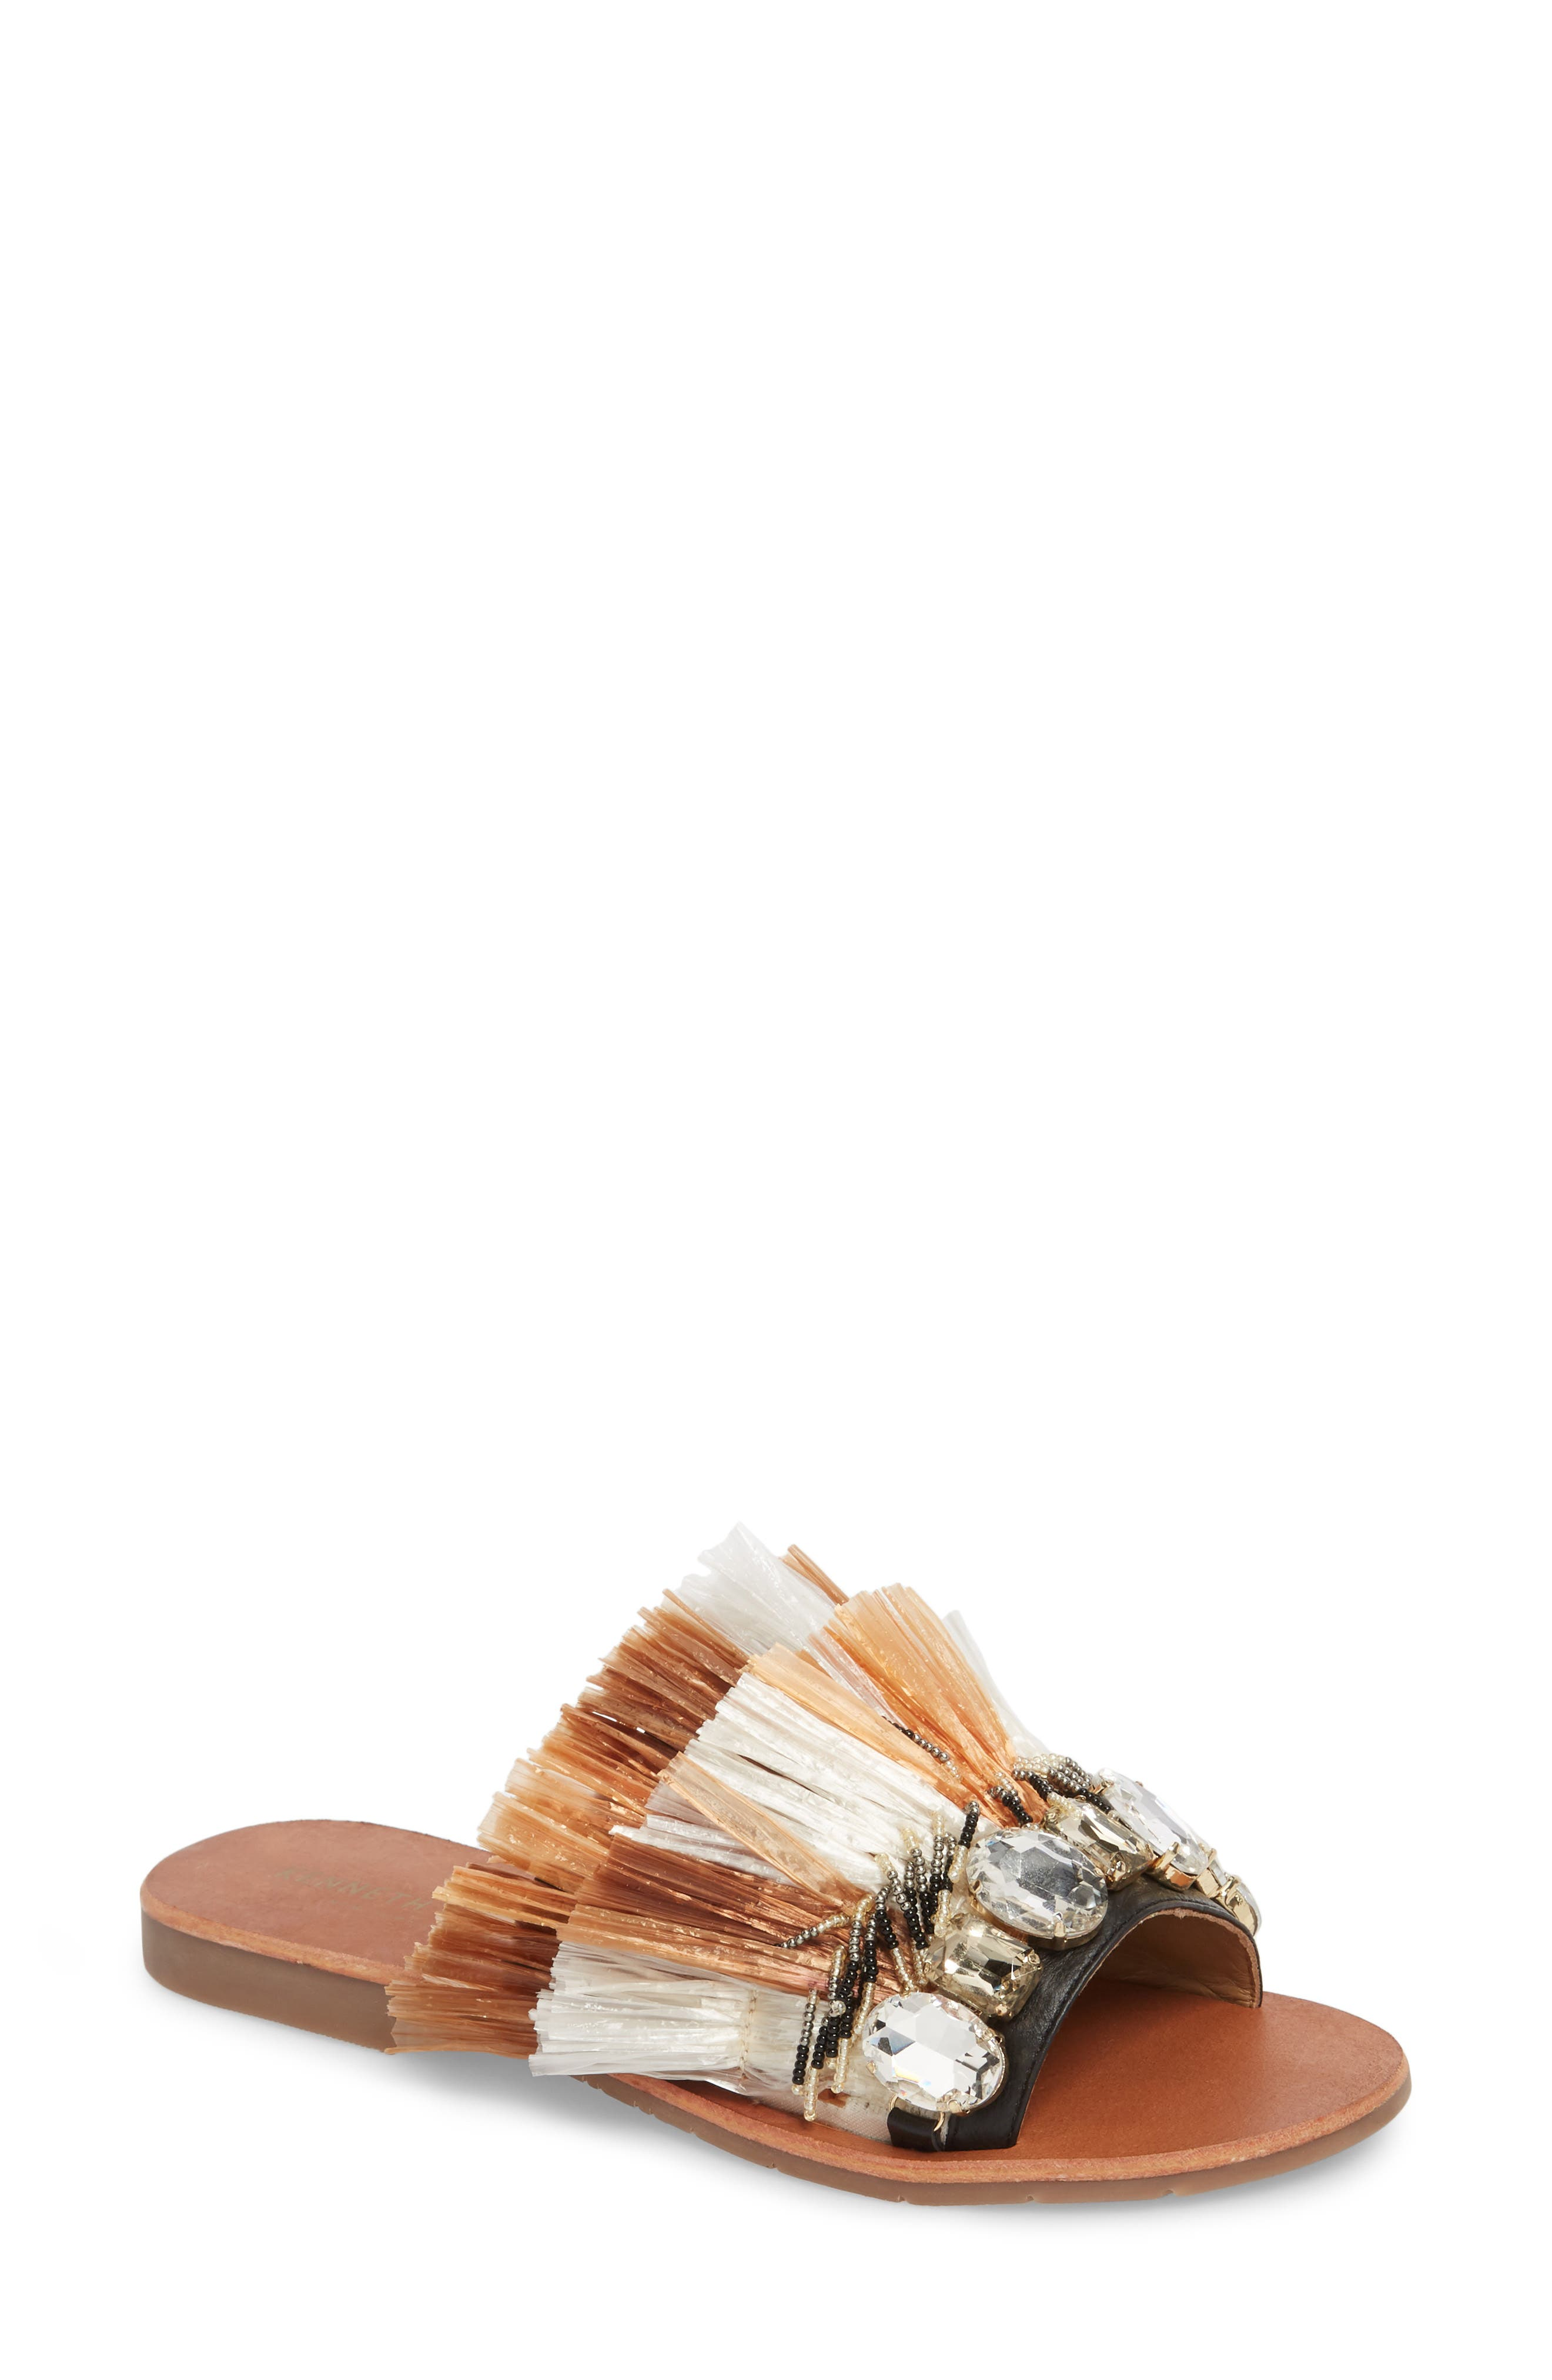 Heron Slide Sandal,                         Main,                         color,